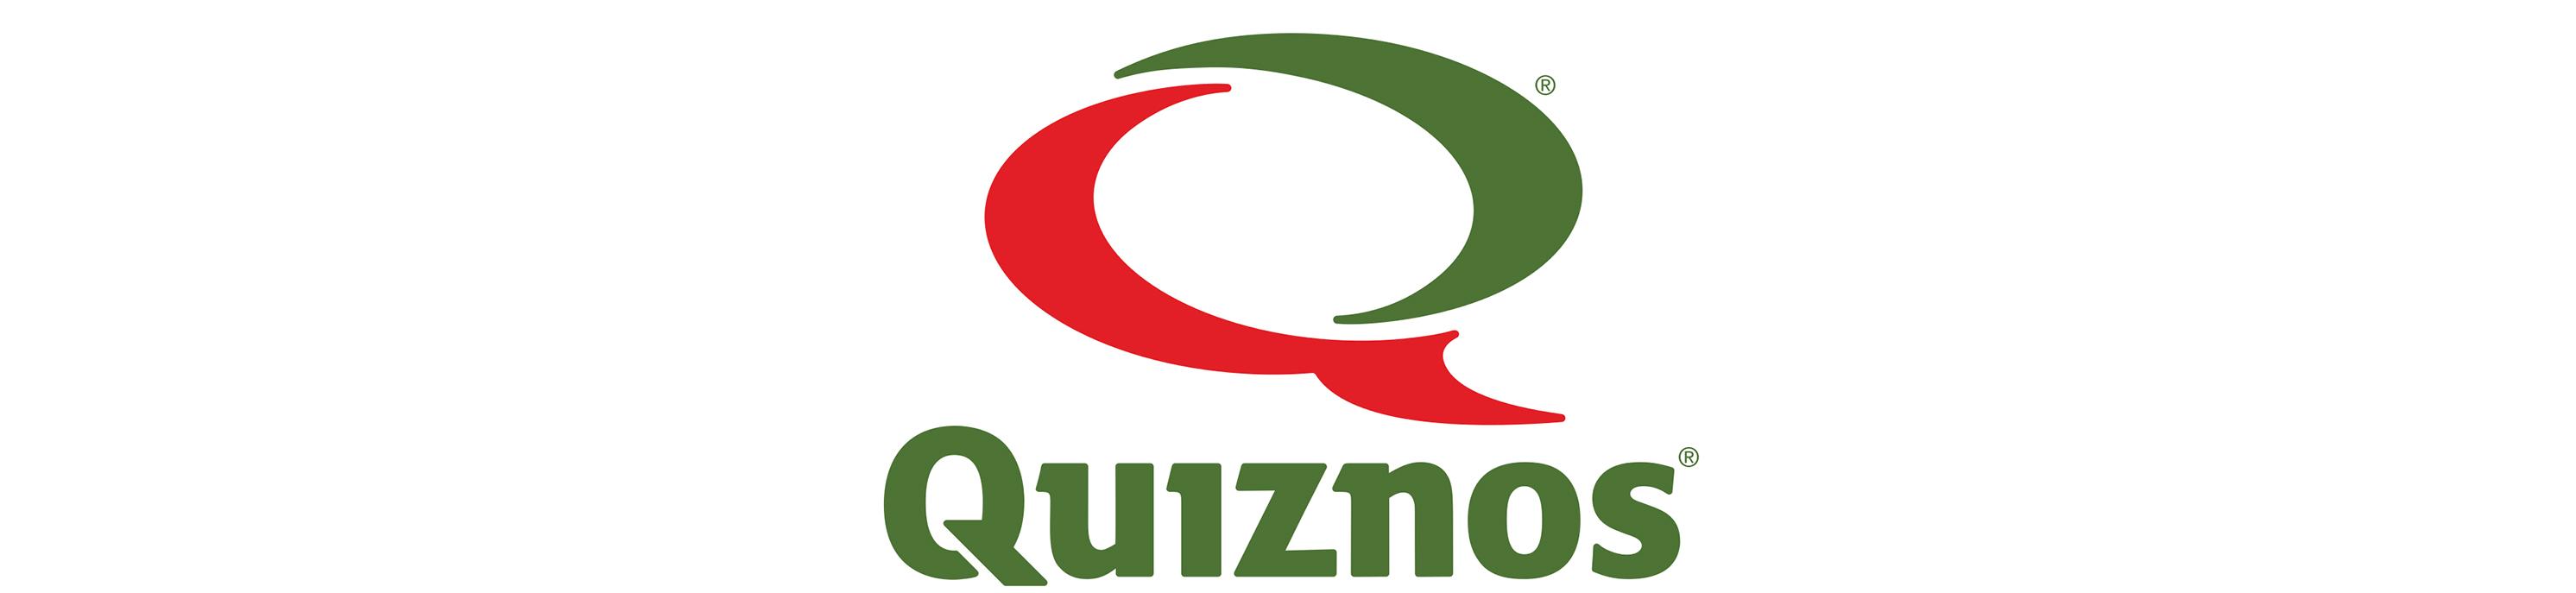 Quiznos Logos 2984x687